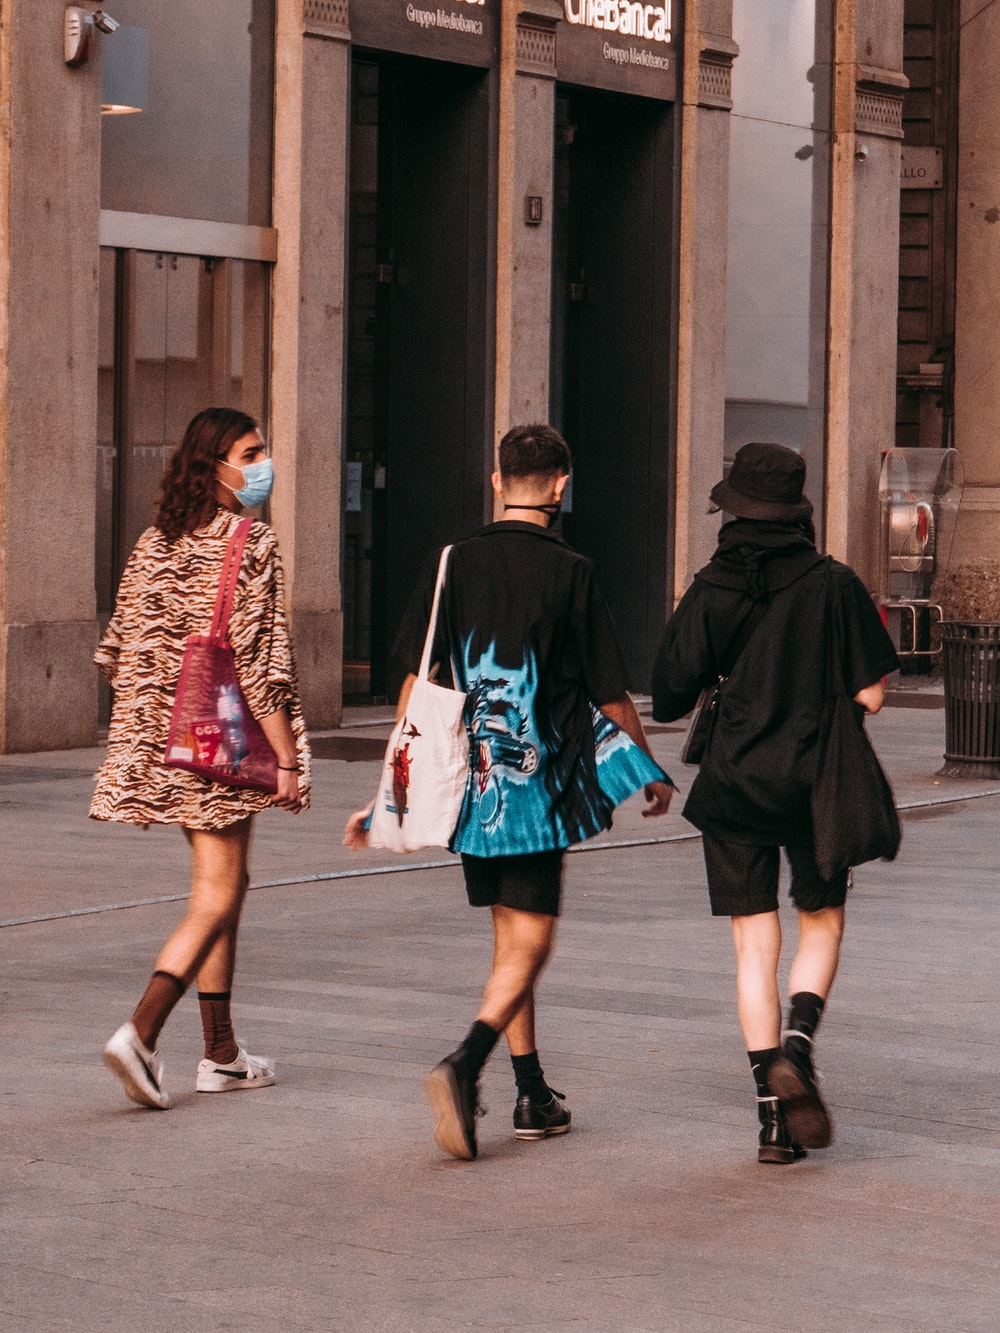 2 girls in green and black dress walking on sidewalk during daytime